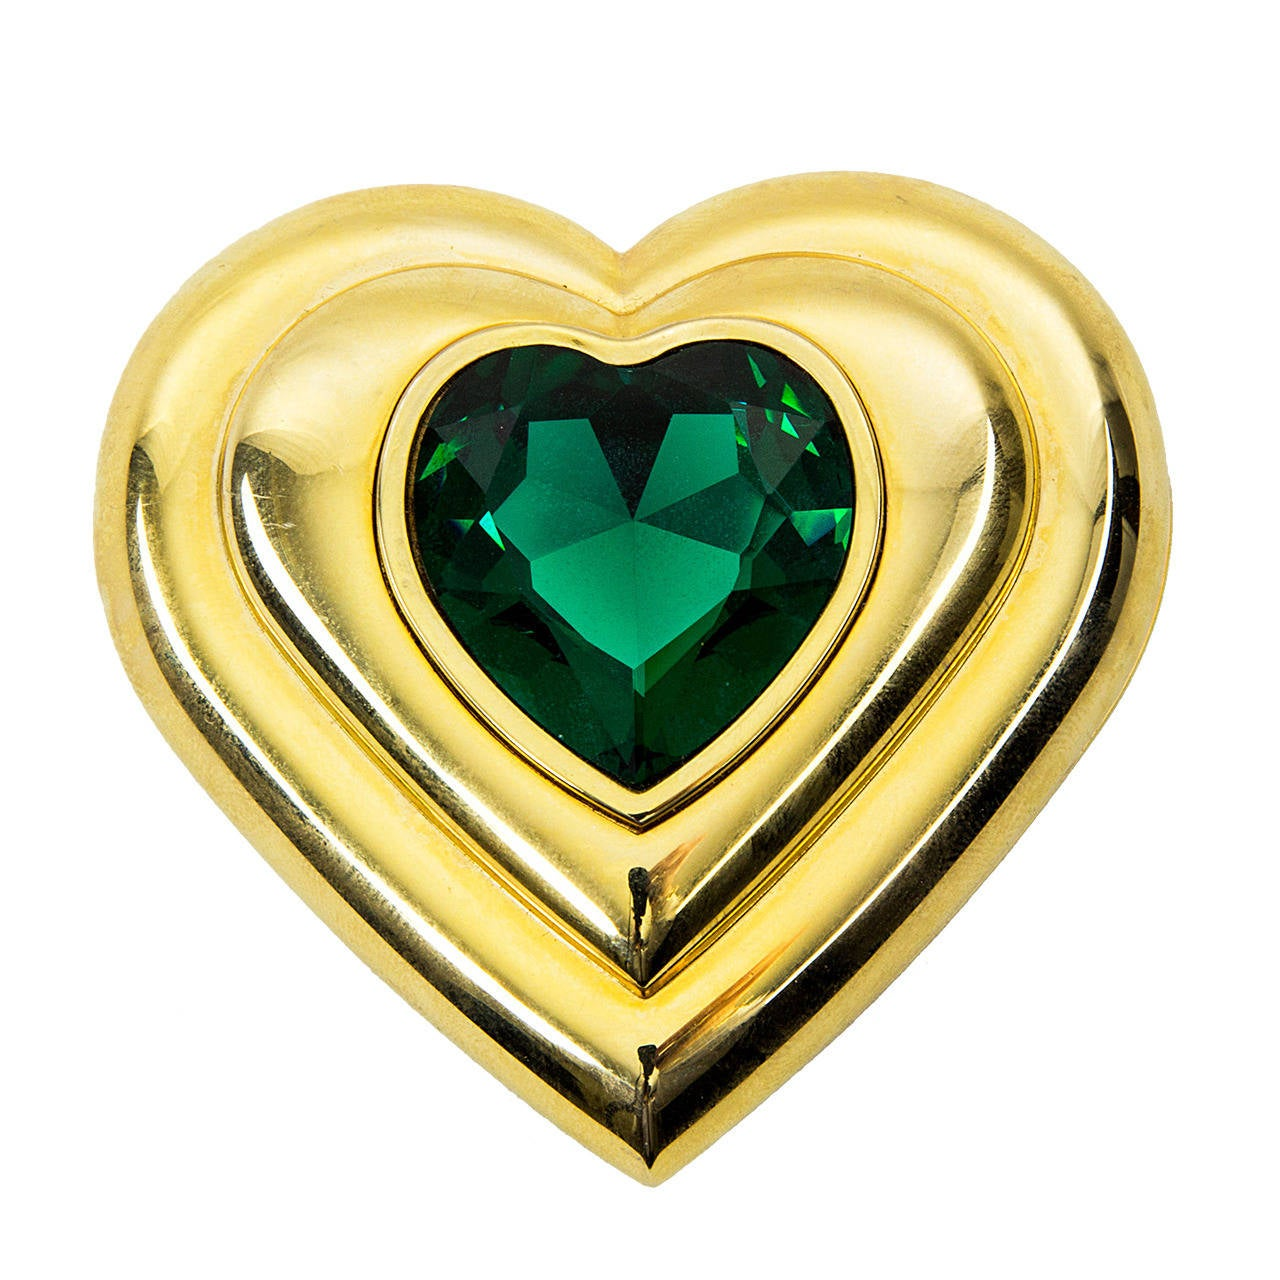 e3fb1156936 Yves Saint Laurent Paris Emerald Green Crystal Jewel Heart Compact YSL For  Sale